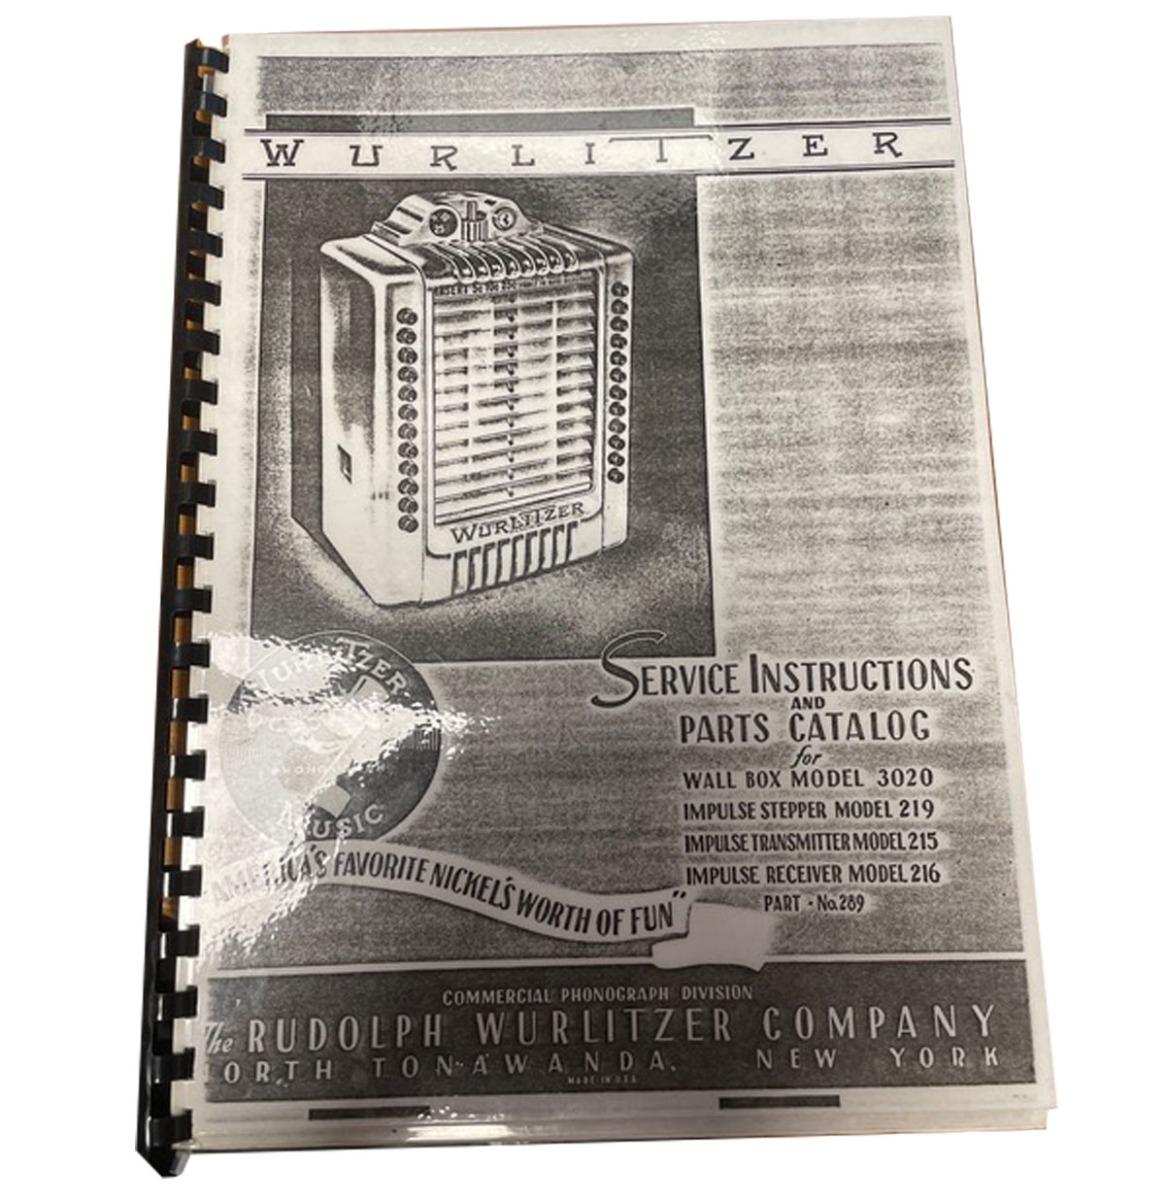 Wurlitzer Wall Box 3020 And Stepper 219 Manual - Kopie